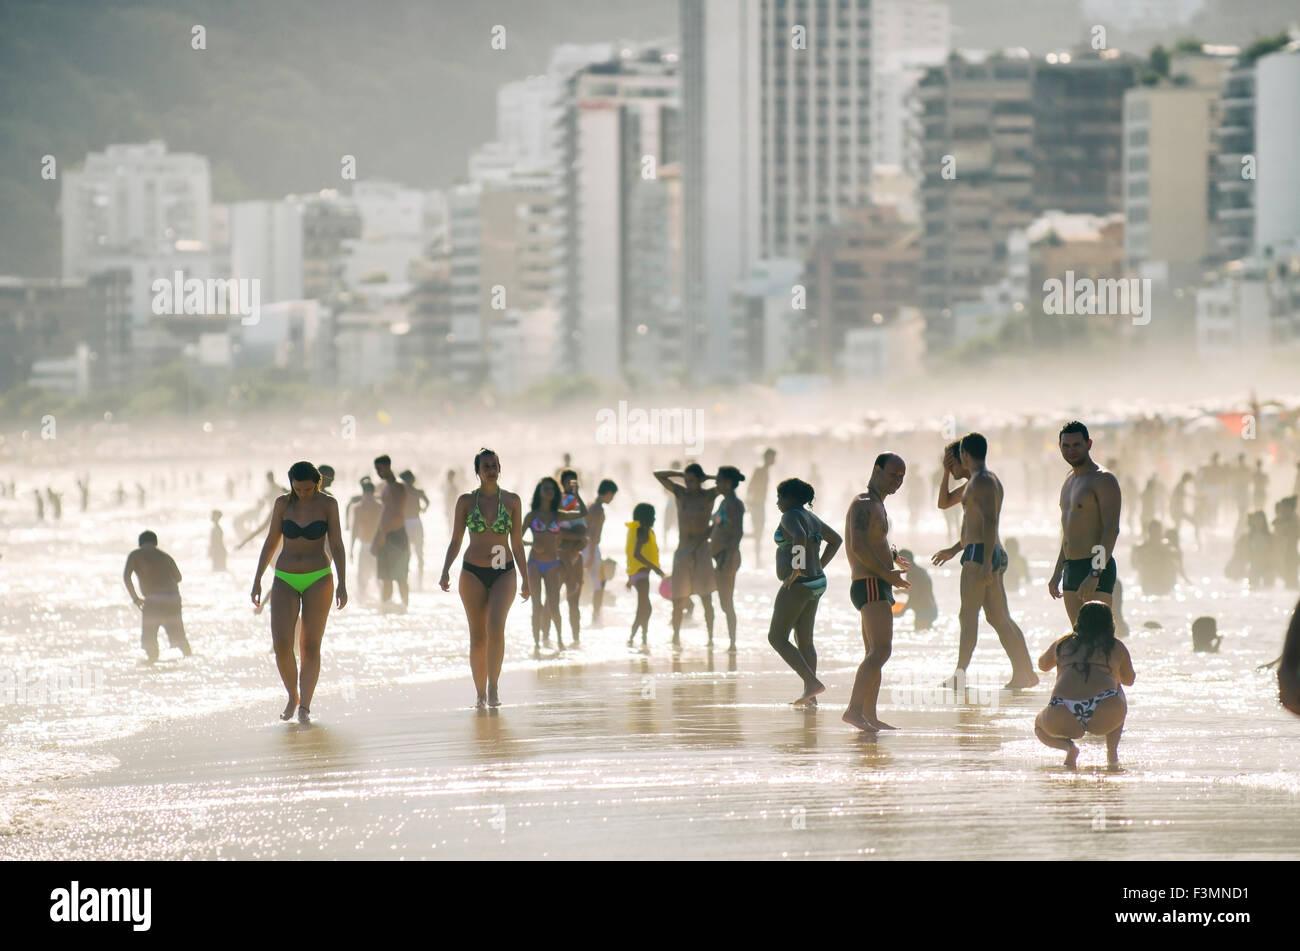 RIO DE JANEIRO, FEBRUARY 23, 2014: Silhouettes of beachgoers stand on the shore of Ipanema Beach against the city - Stock Image